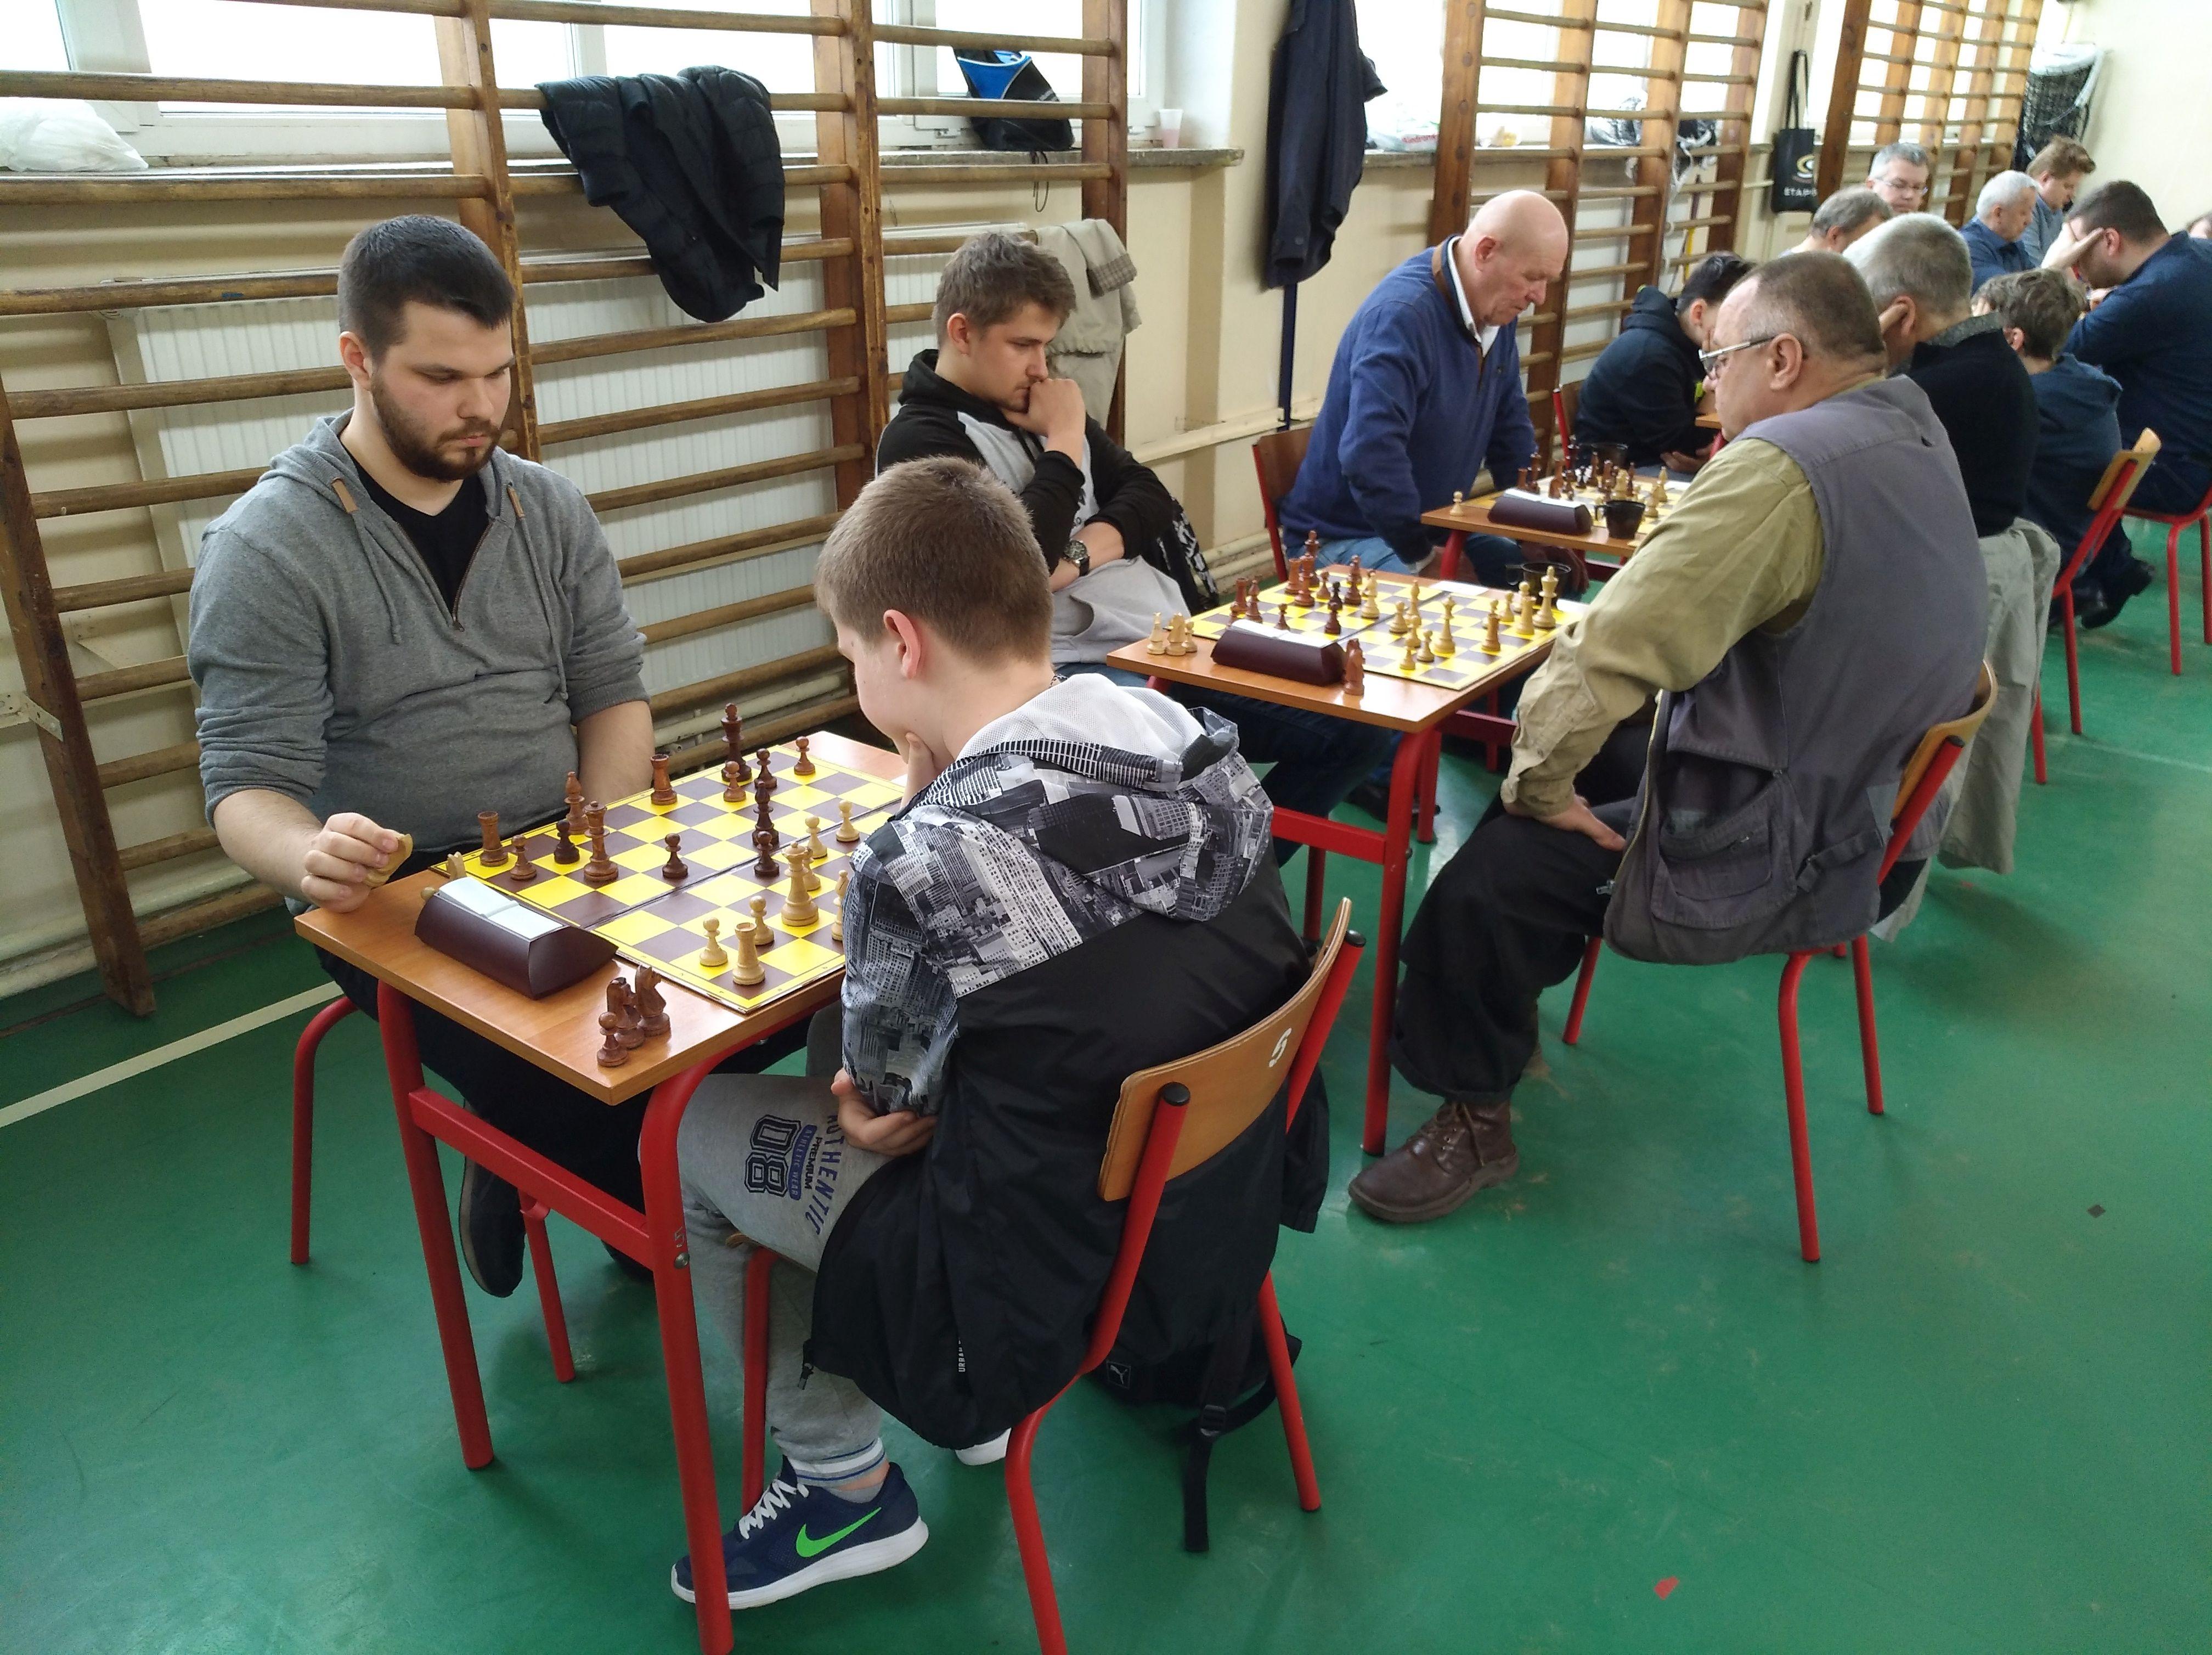 szachy w Gryficach, turniej o puchar burmistrza 2018